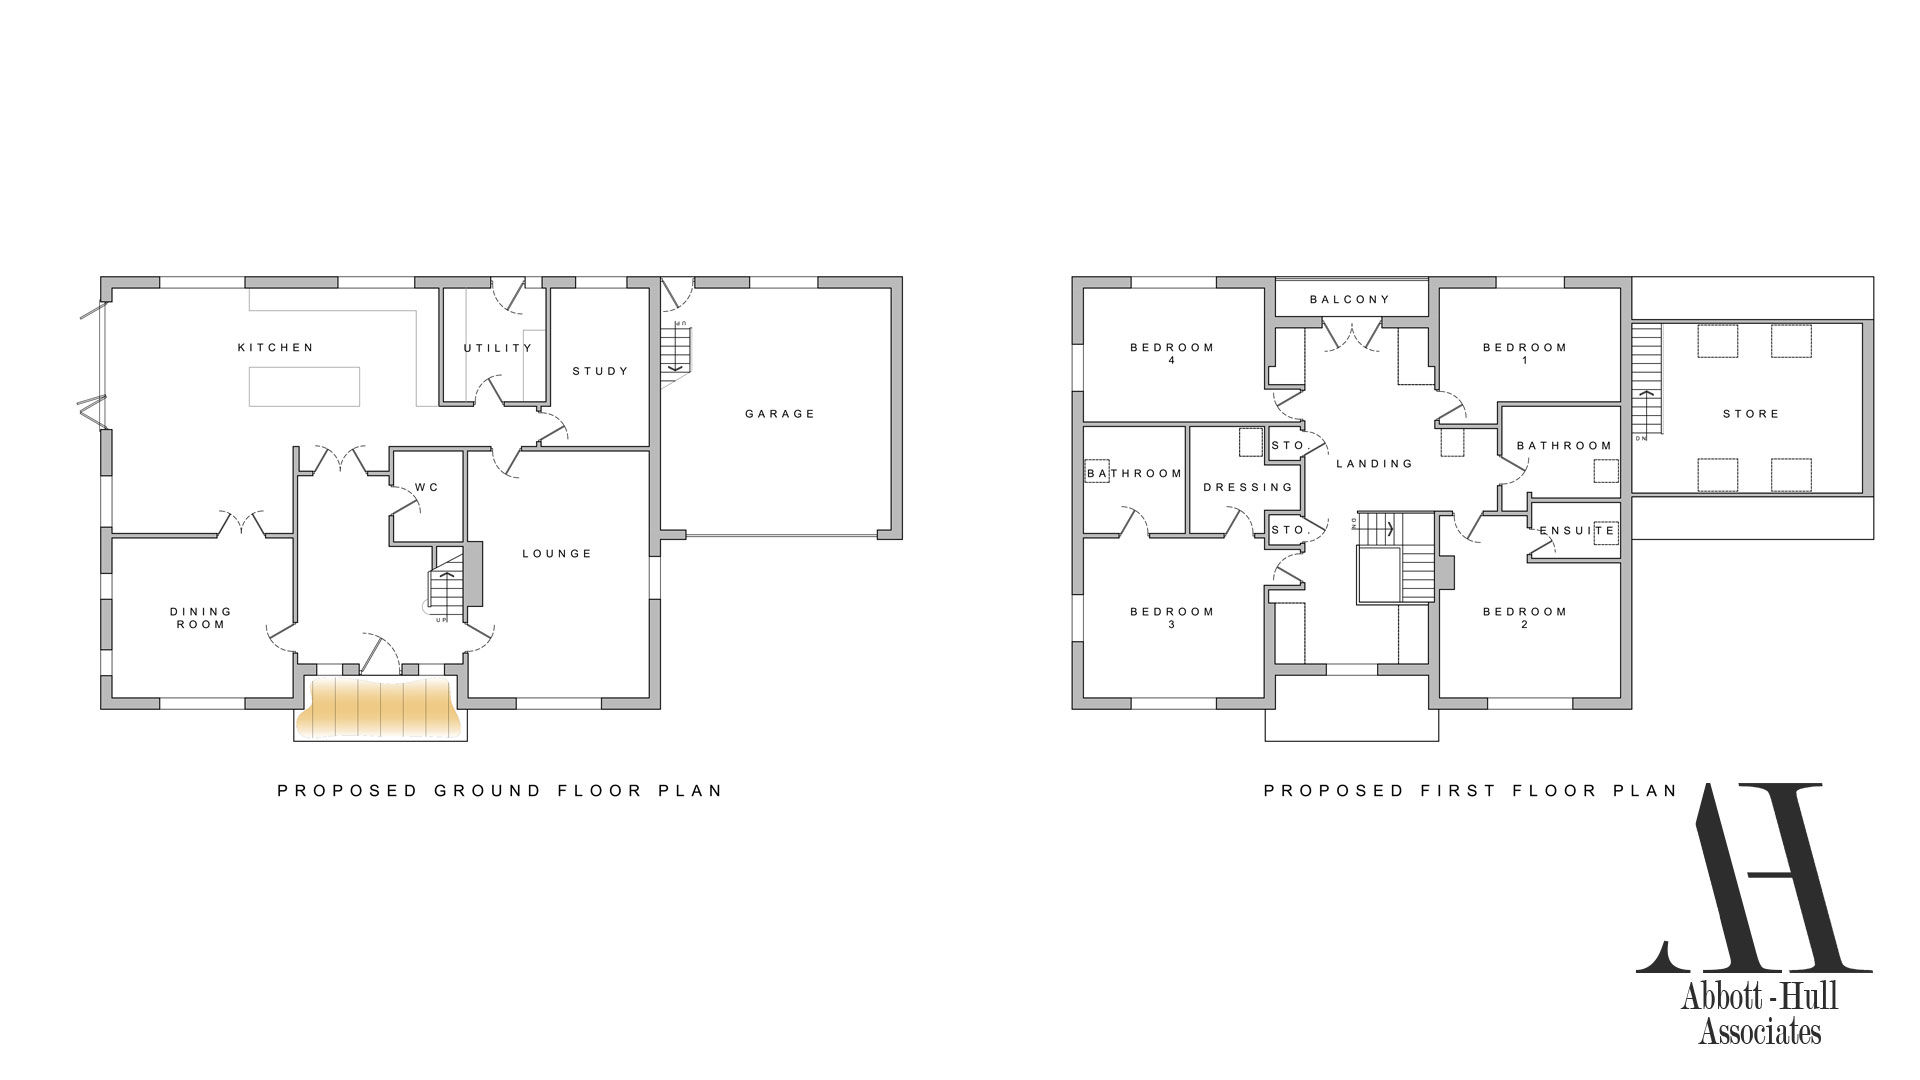 New Dwelling, Applegarth, Singleton - Proposed Plans